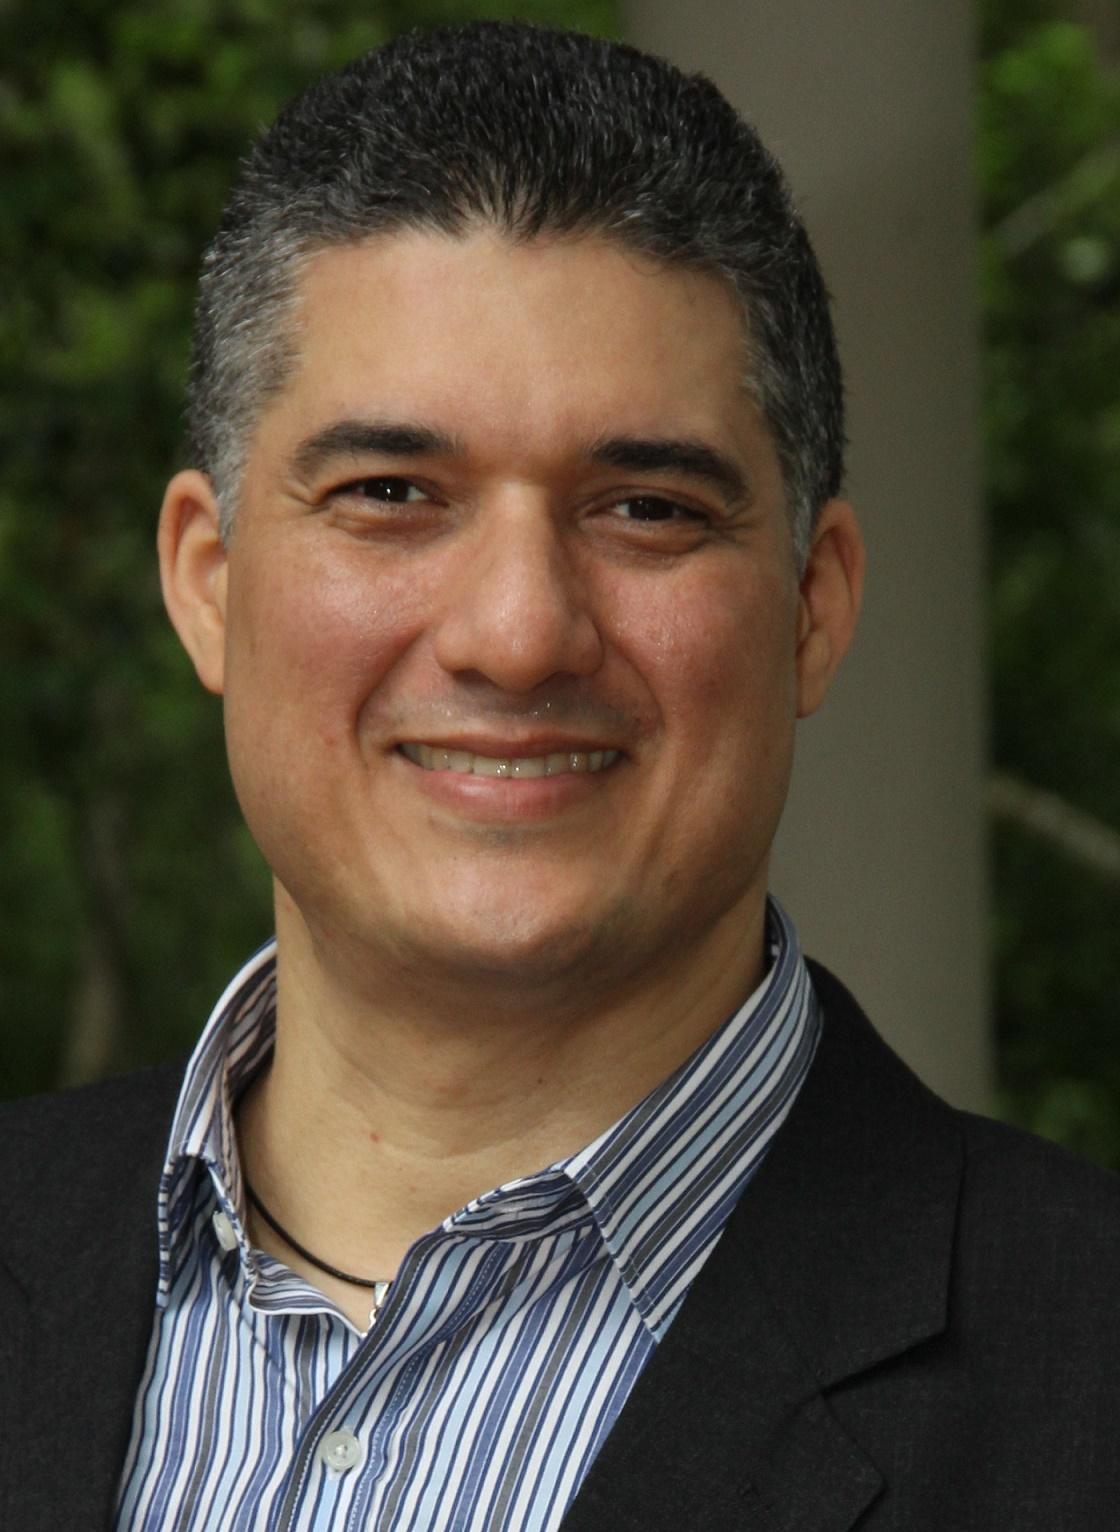 Carlos Alberto Medina